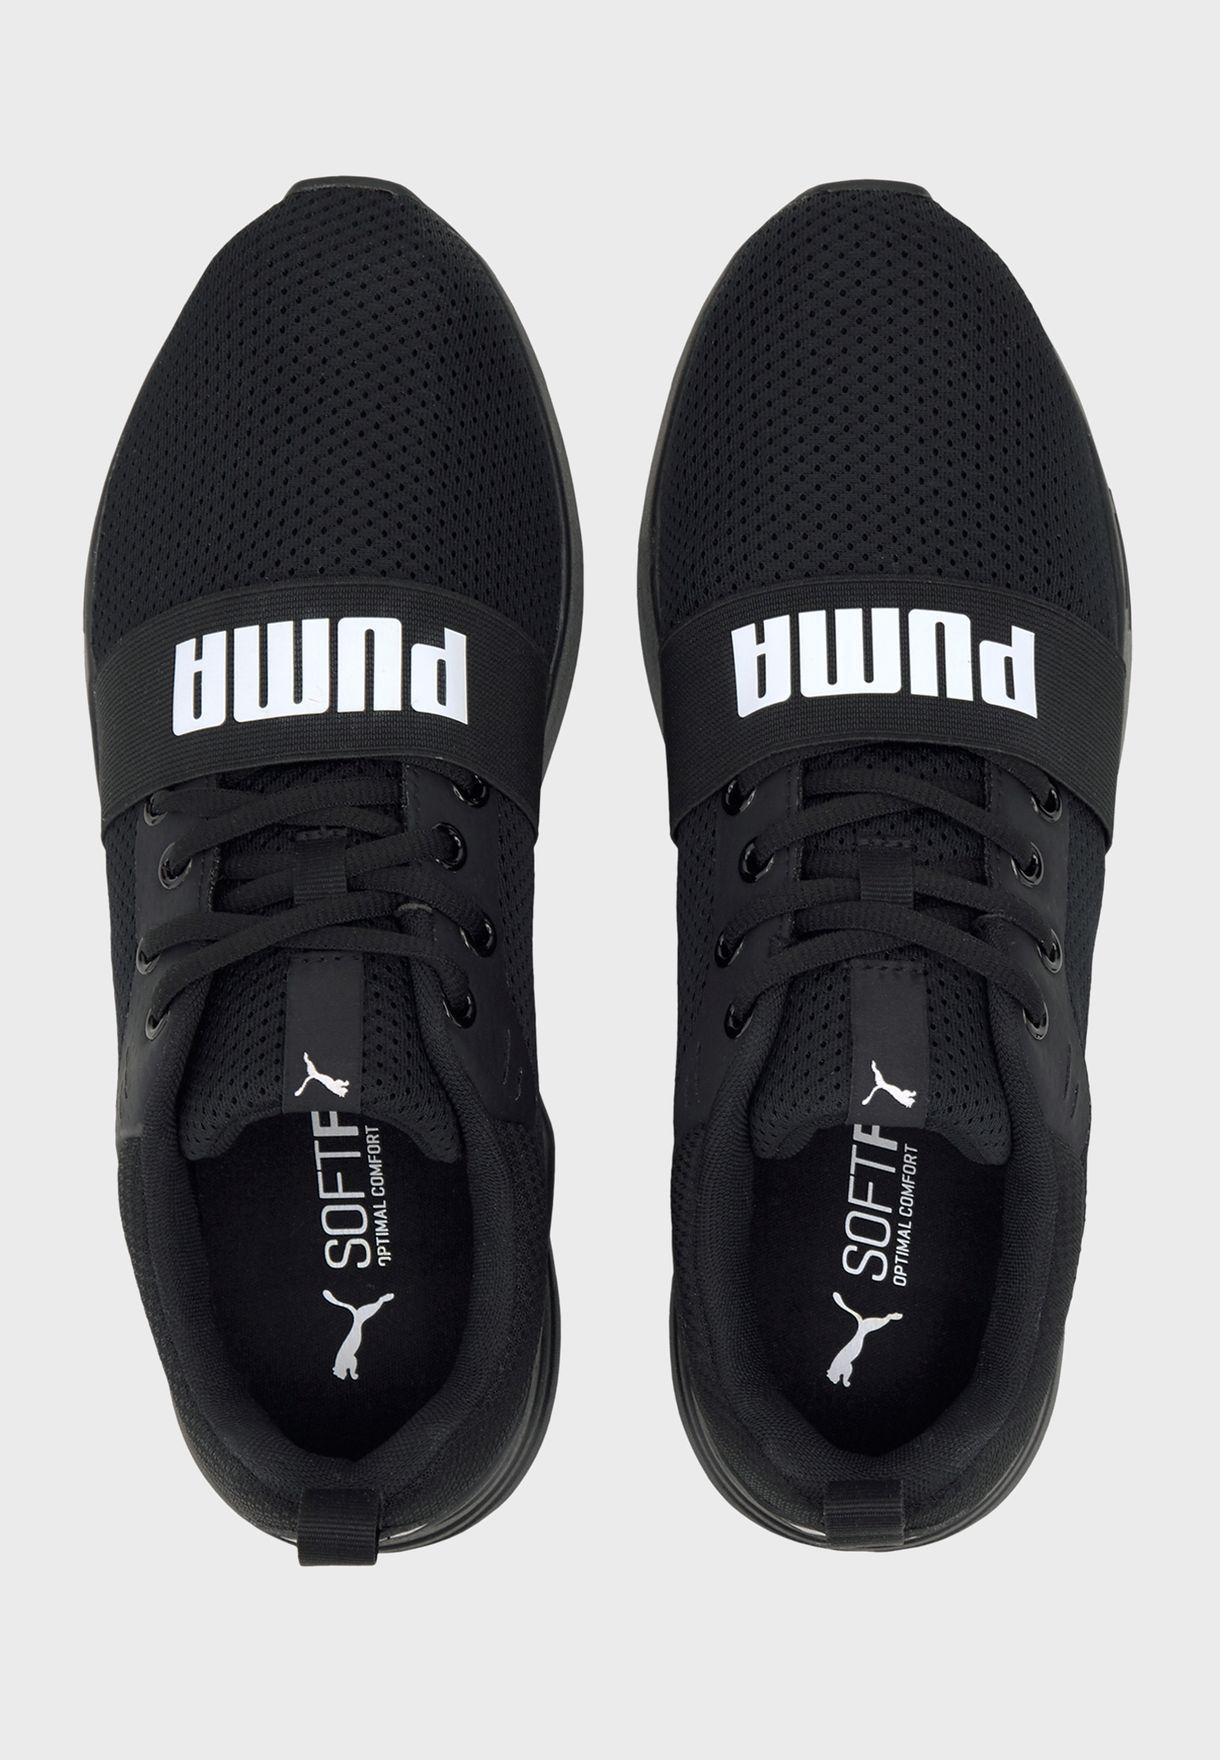 Wired Run